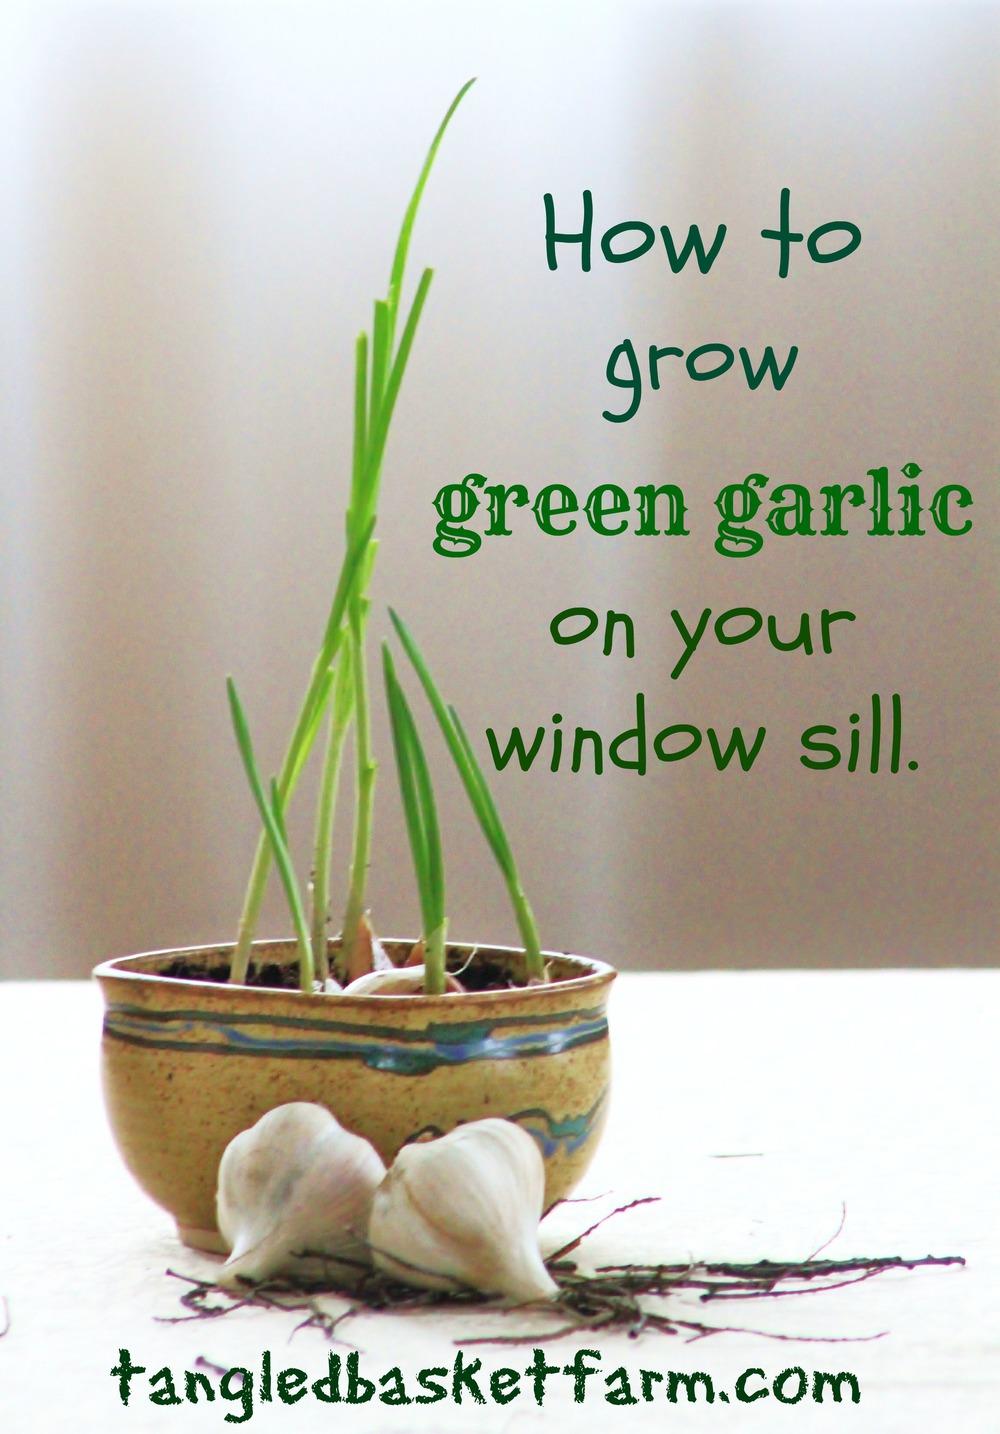 How to grow green garlic indoors.